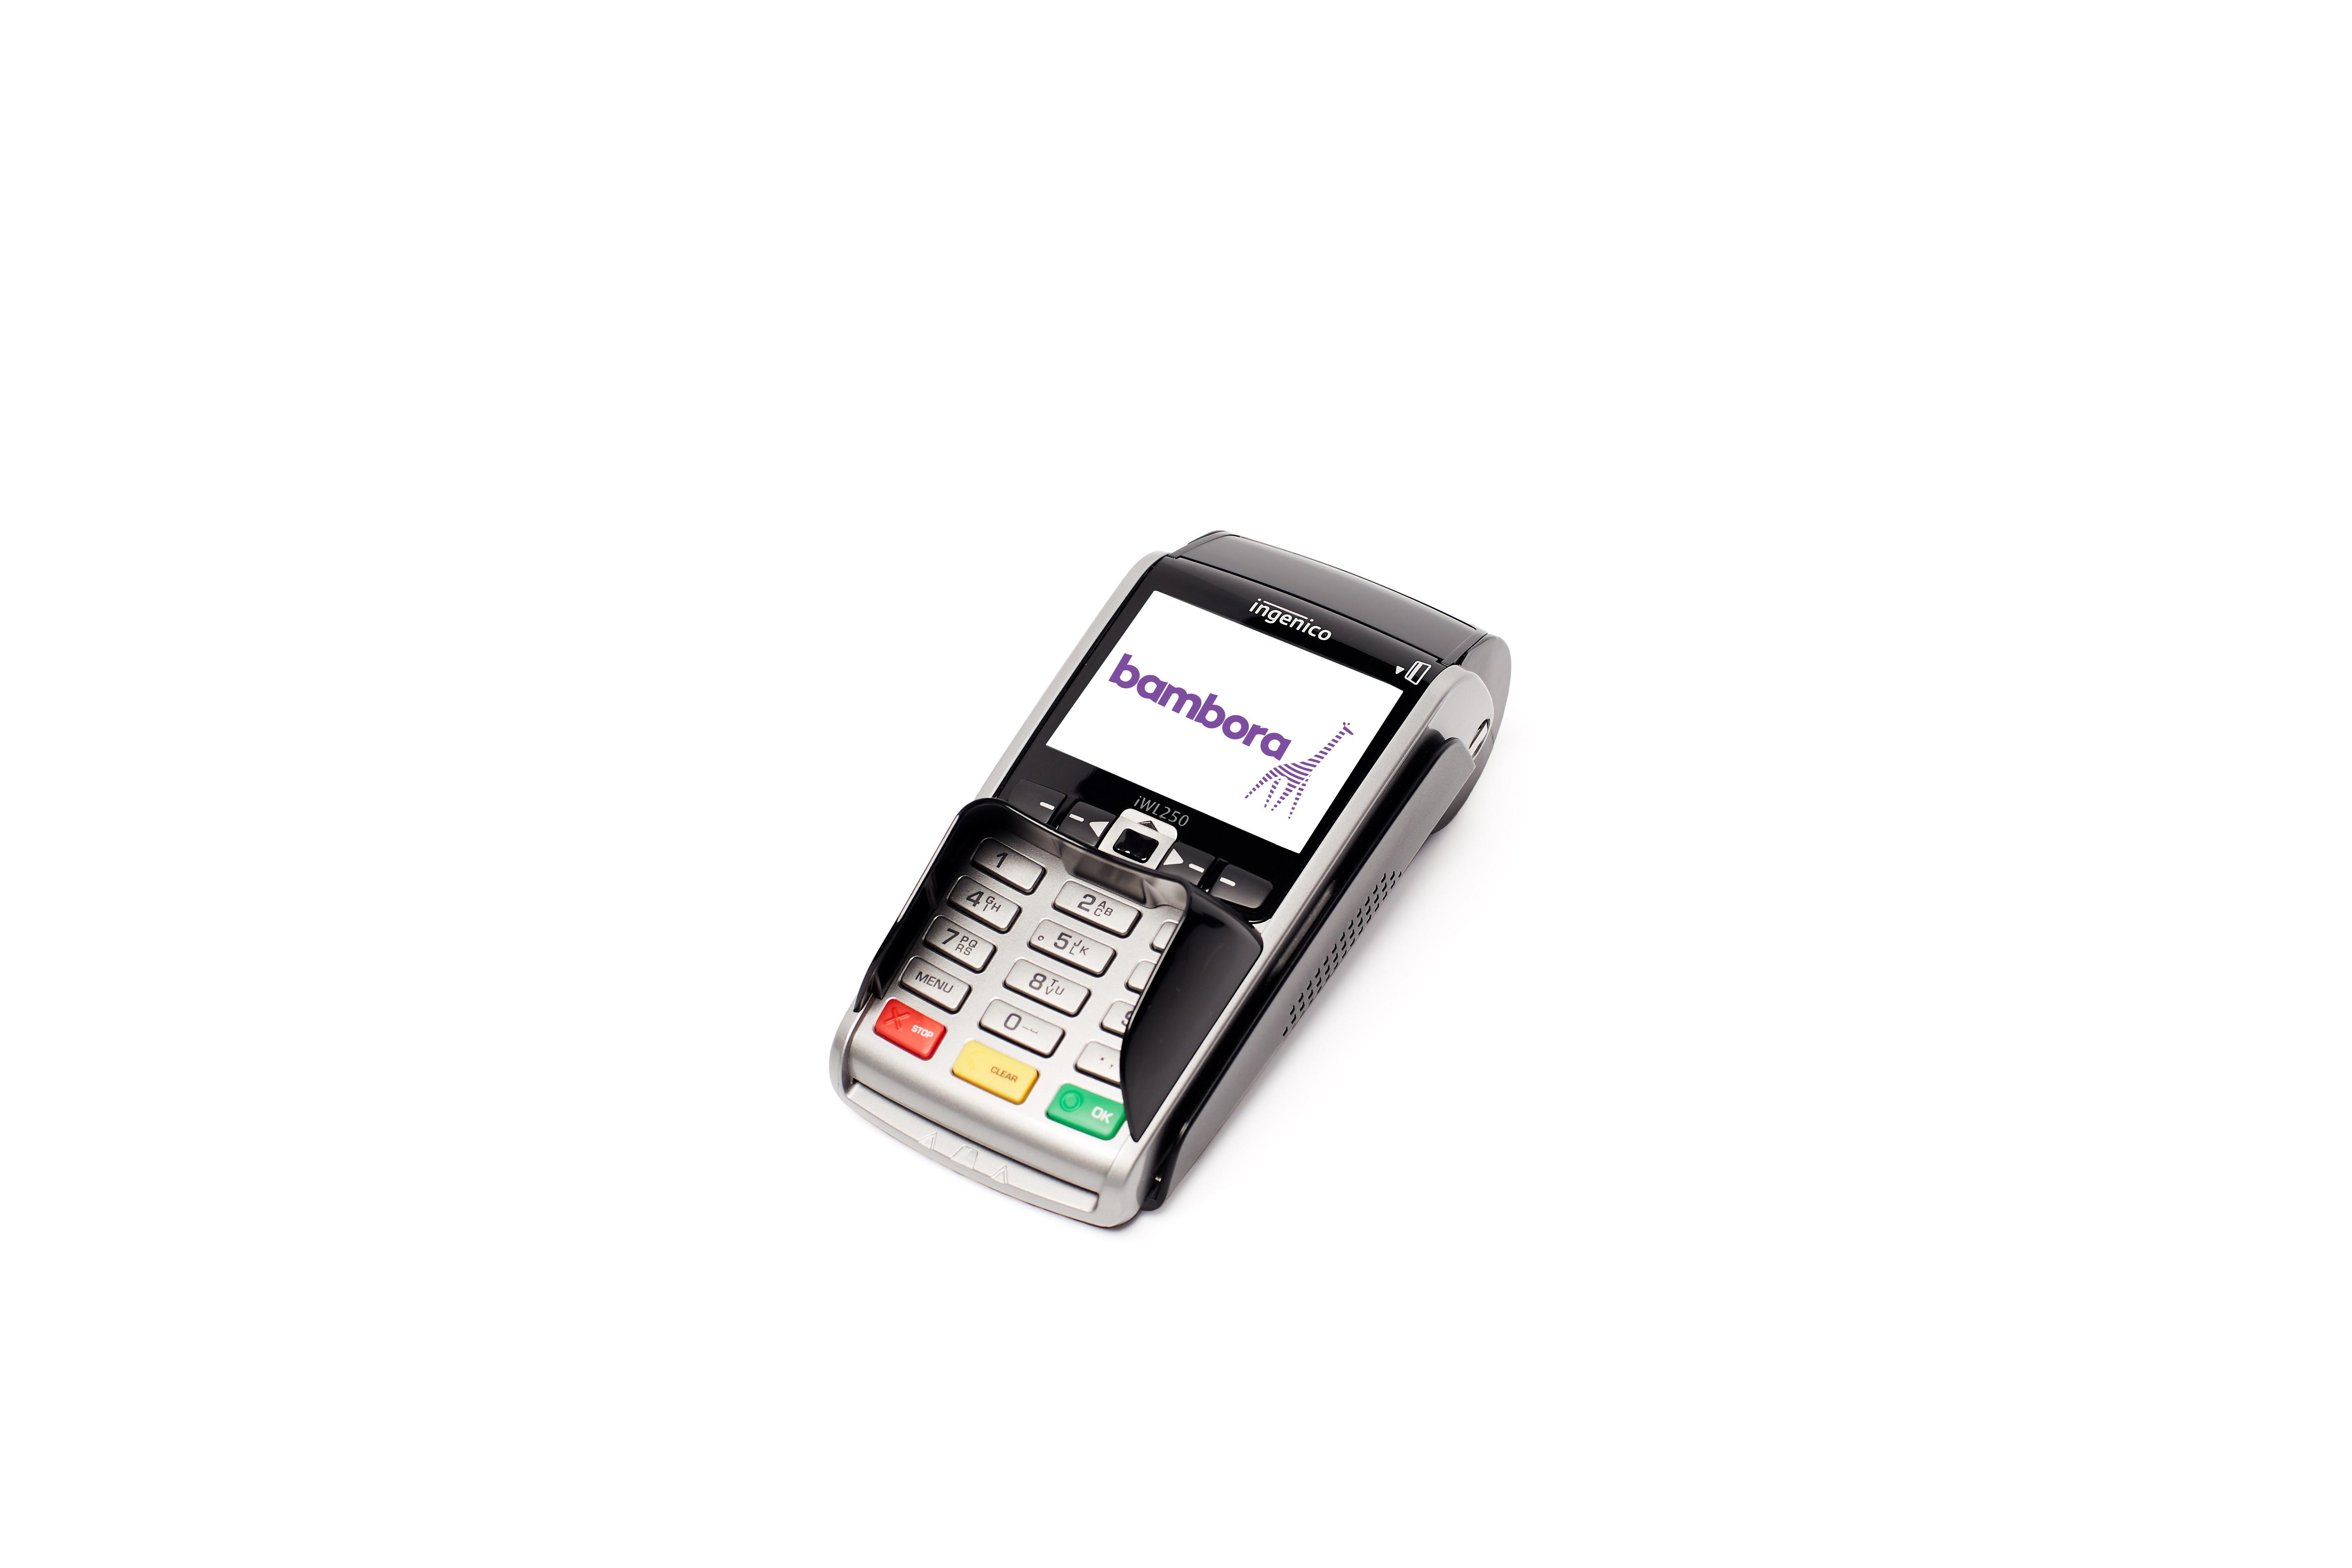 Korttidsleie betalingsterminal